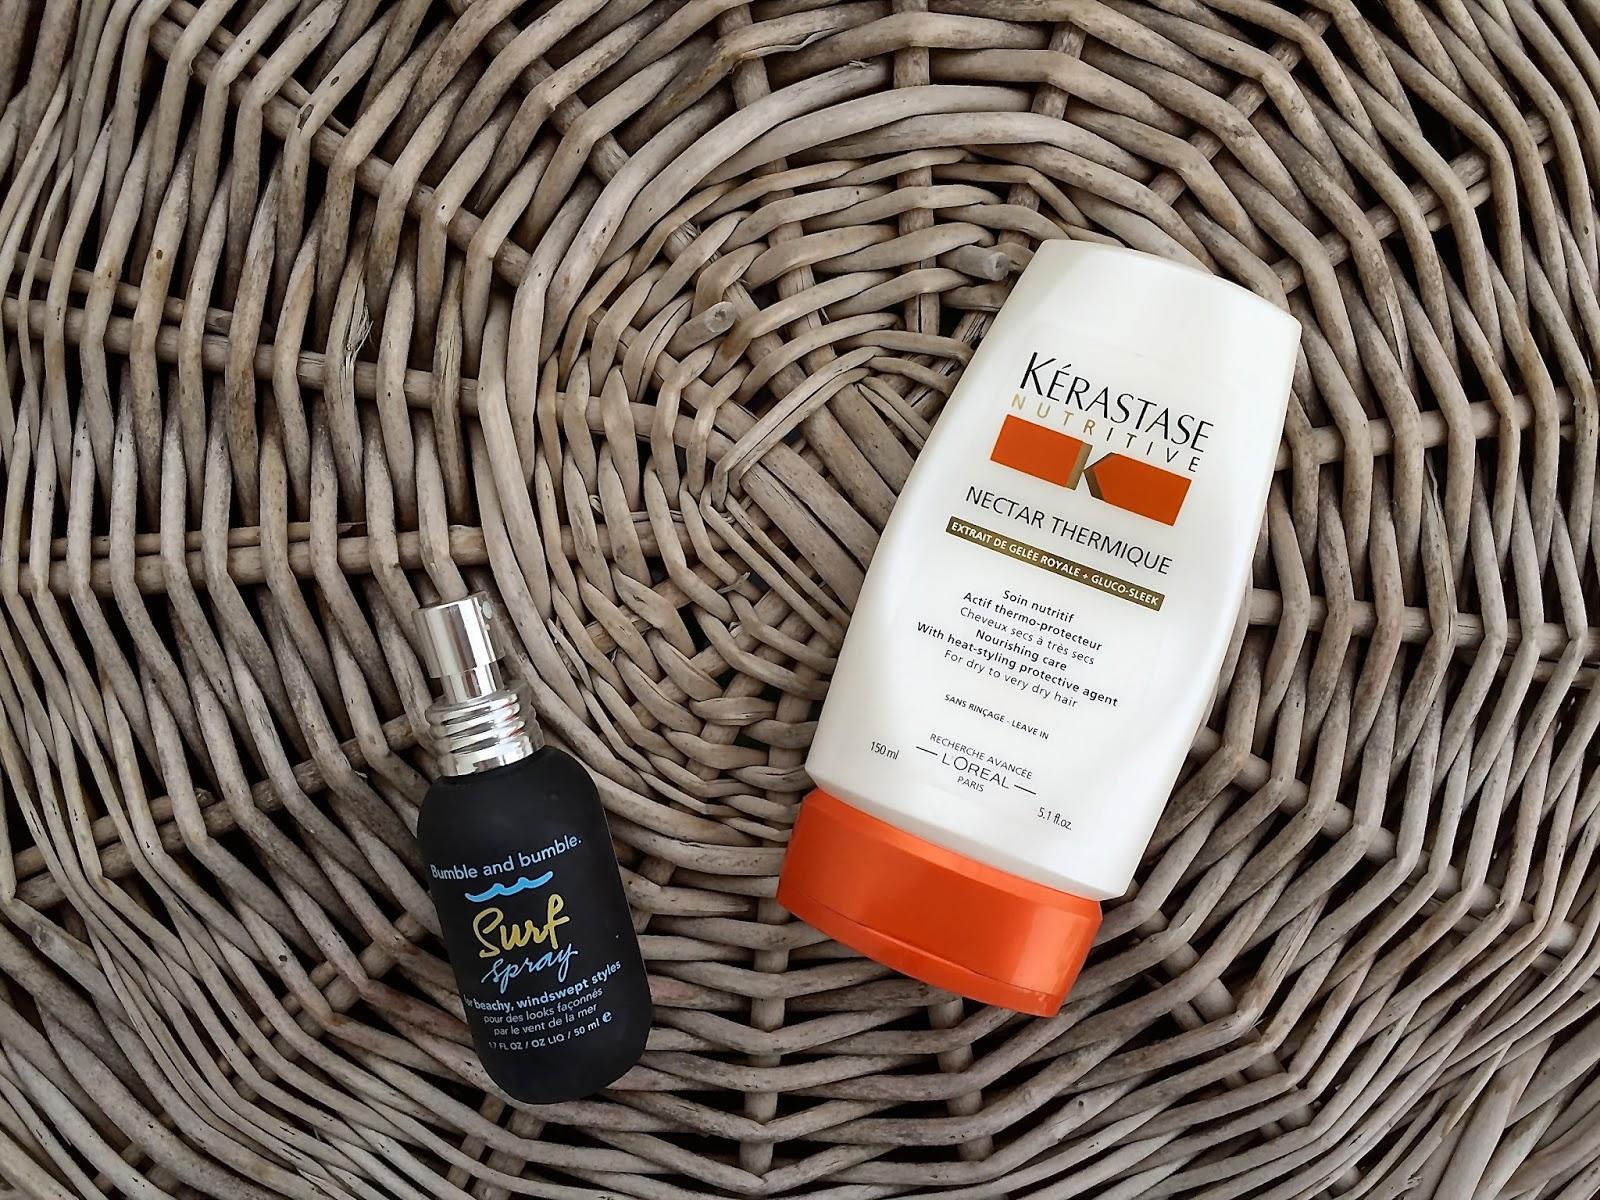 Bumble&Bumble Surf Spray oraz nektar termiczny Kerastase,